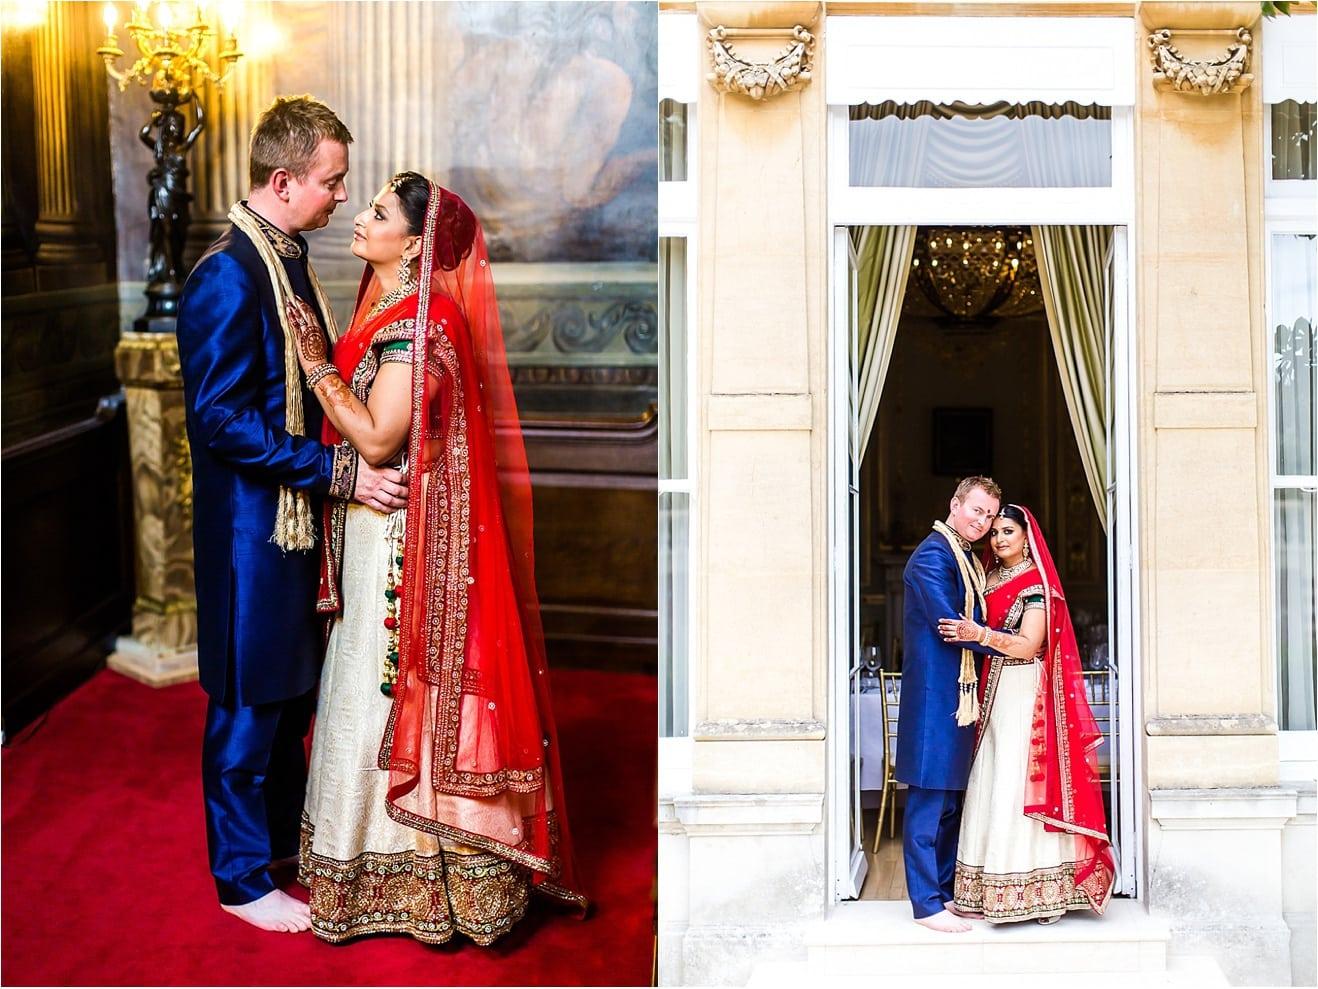 FETCHAM-PARK-SURREY-SWAN-GLOBE-LONDON-WEDDING-PHOTOGRAPHY-EDDIE-JUDD_0004